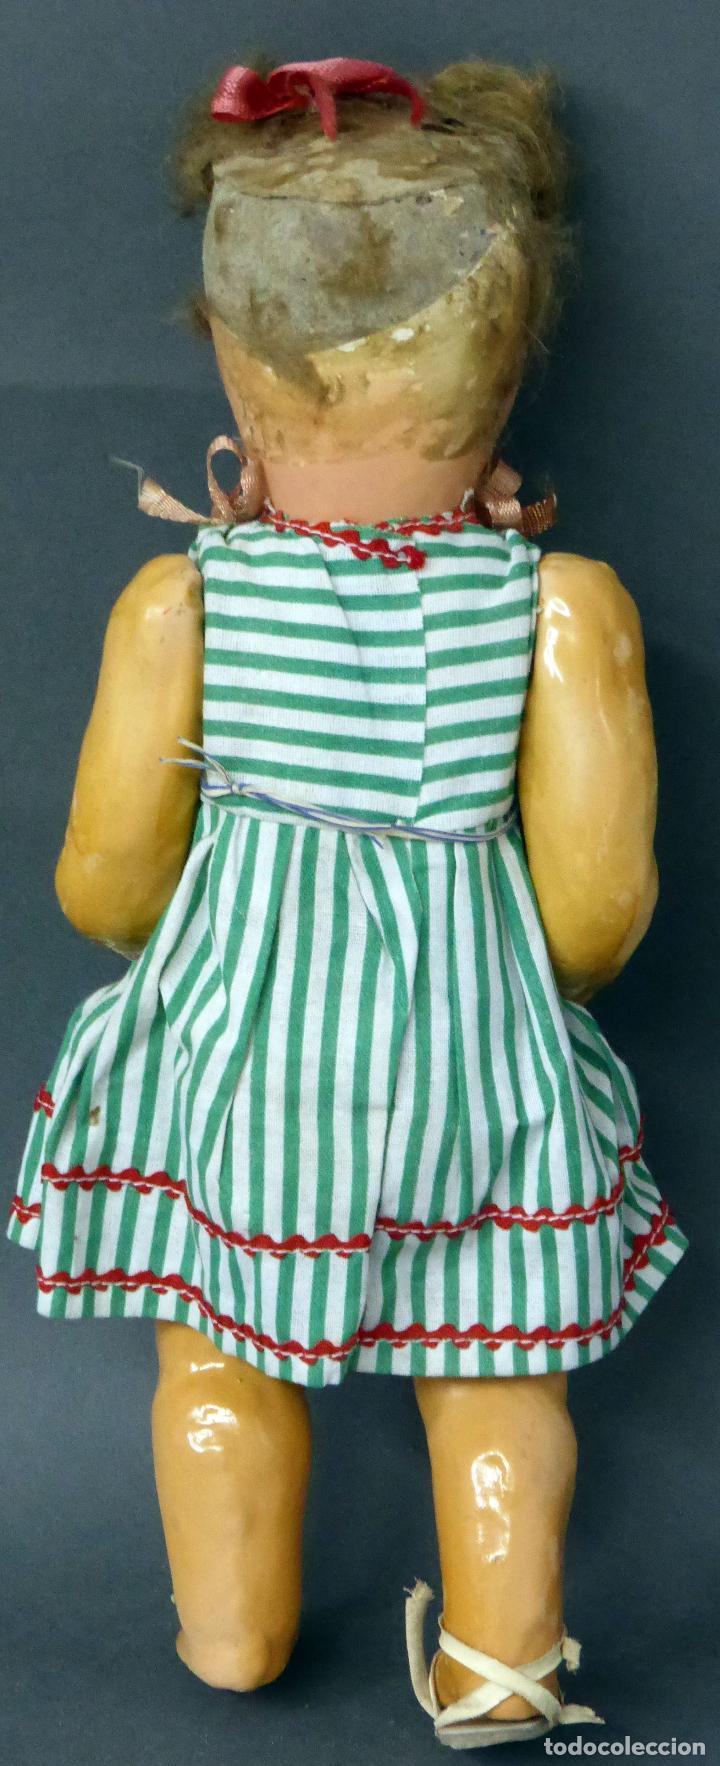 Muñeca española clasica: Muñeca popular cartón piedra articulada ropa original peluca sandalias años 40 33 cm época Mariquita - Foto 4 - 88976784